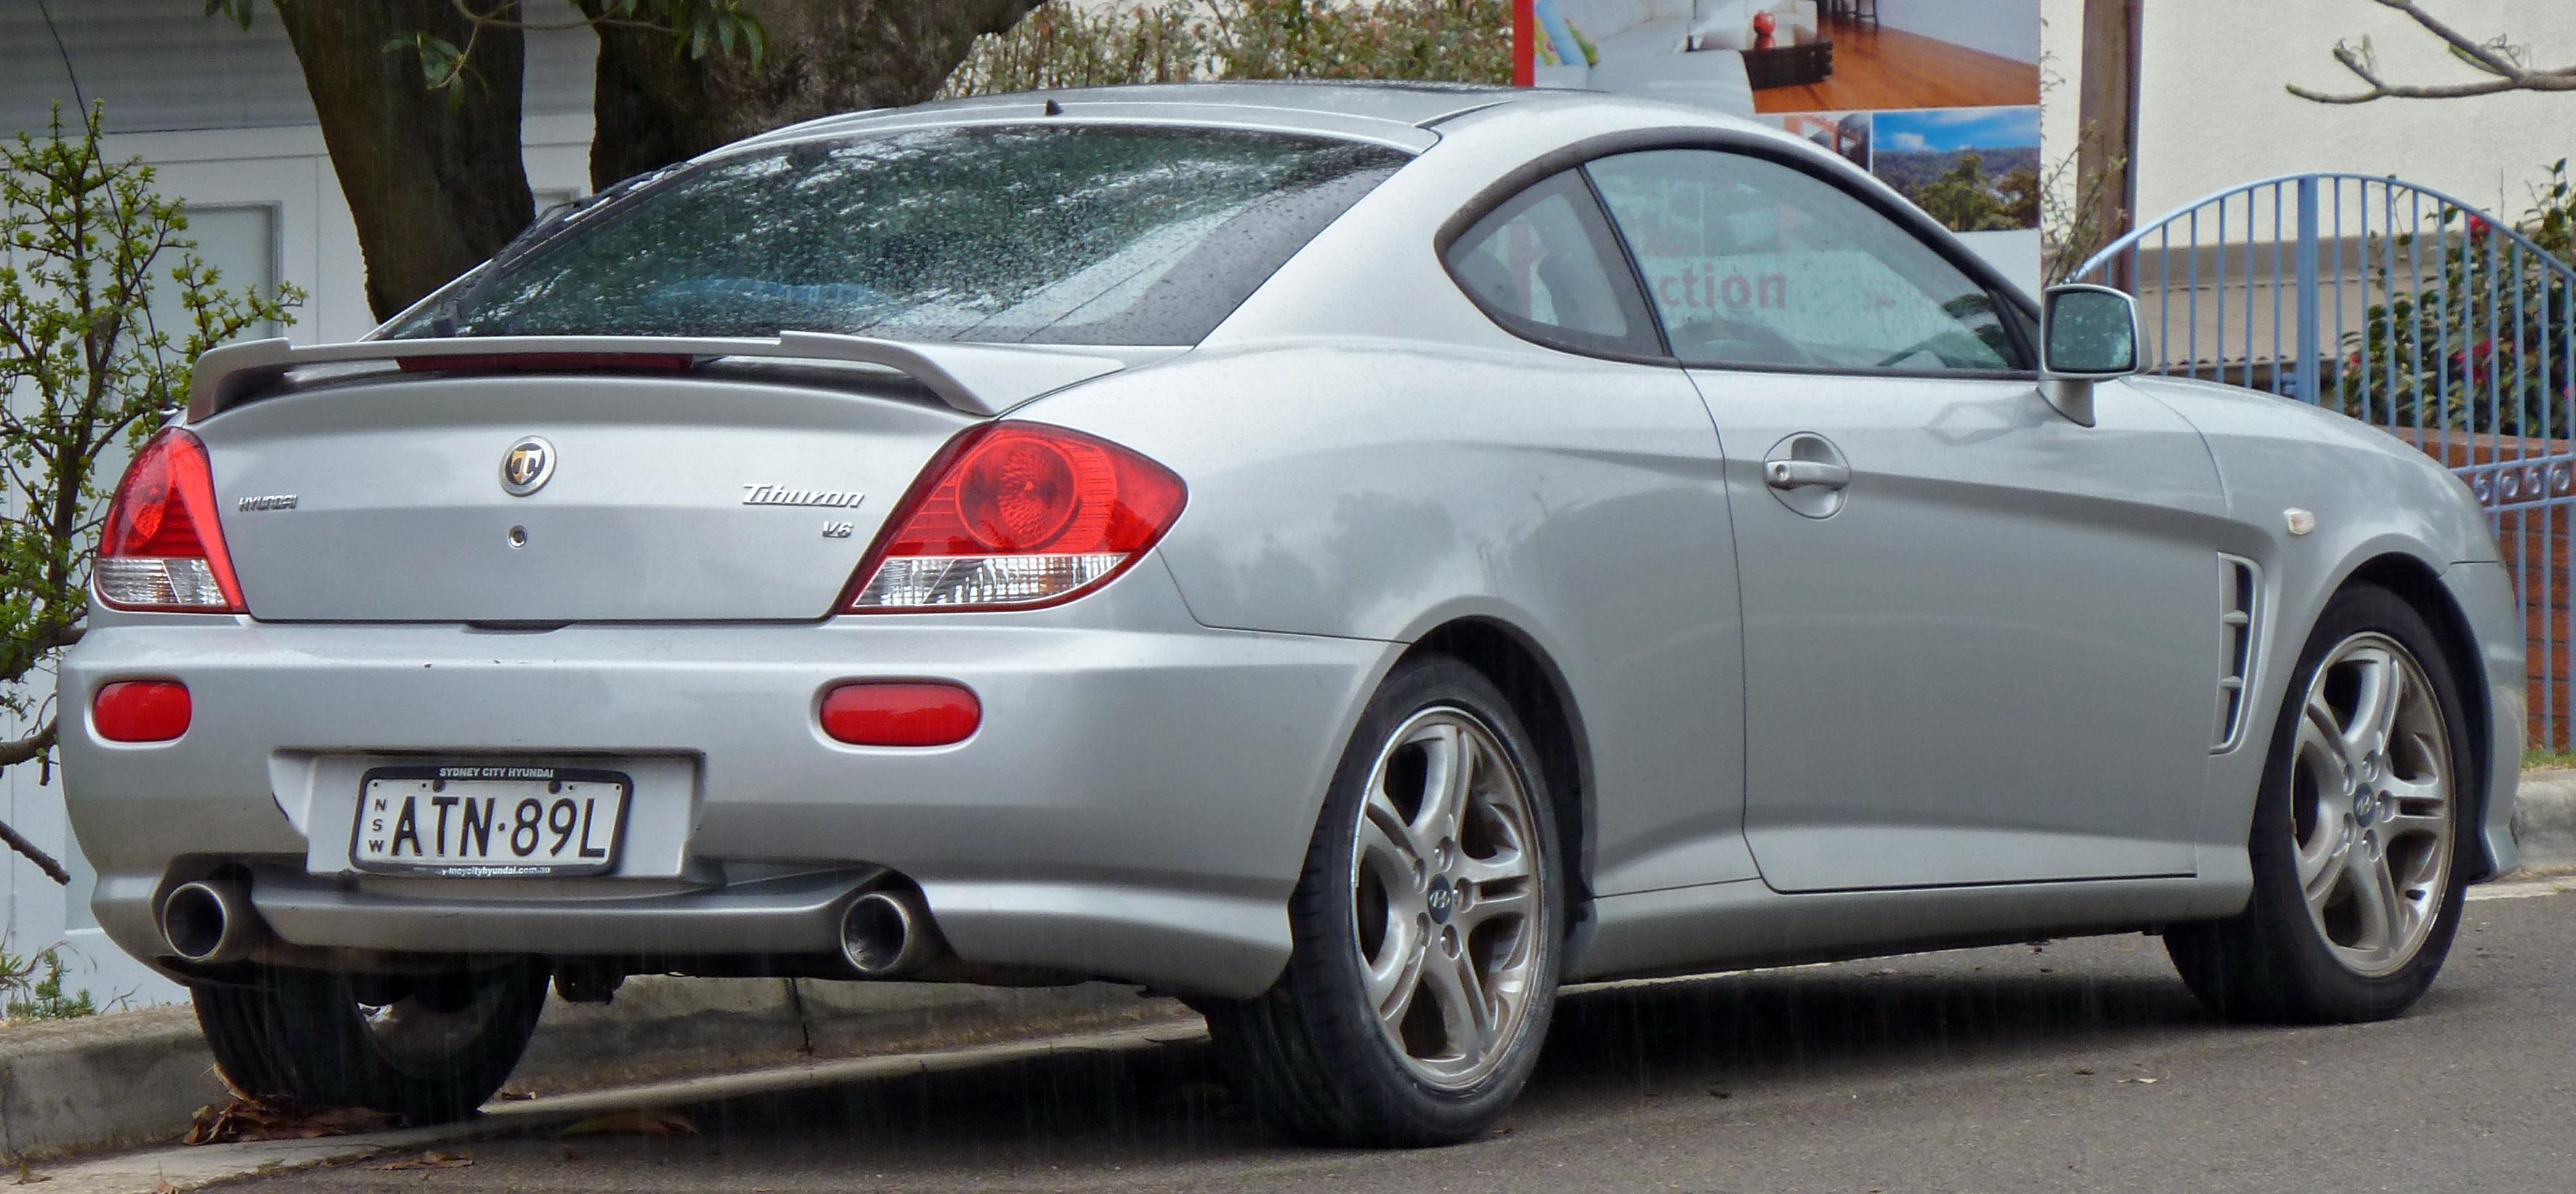 Hyundai Coupe II (GK) 2002 - 2007 Coupe #2